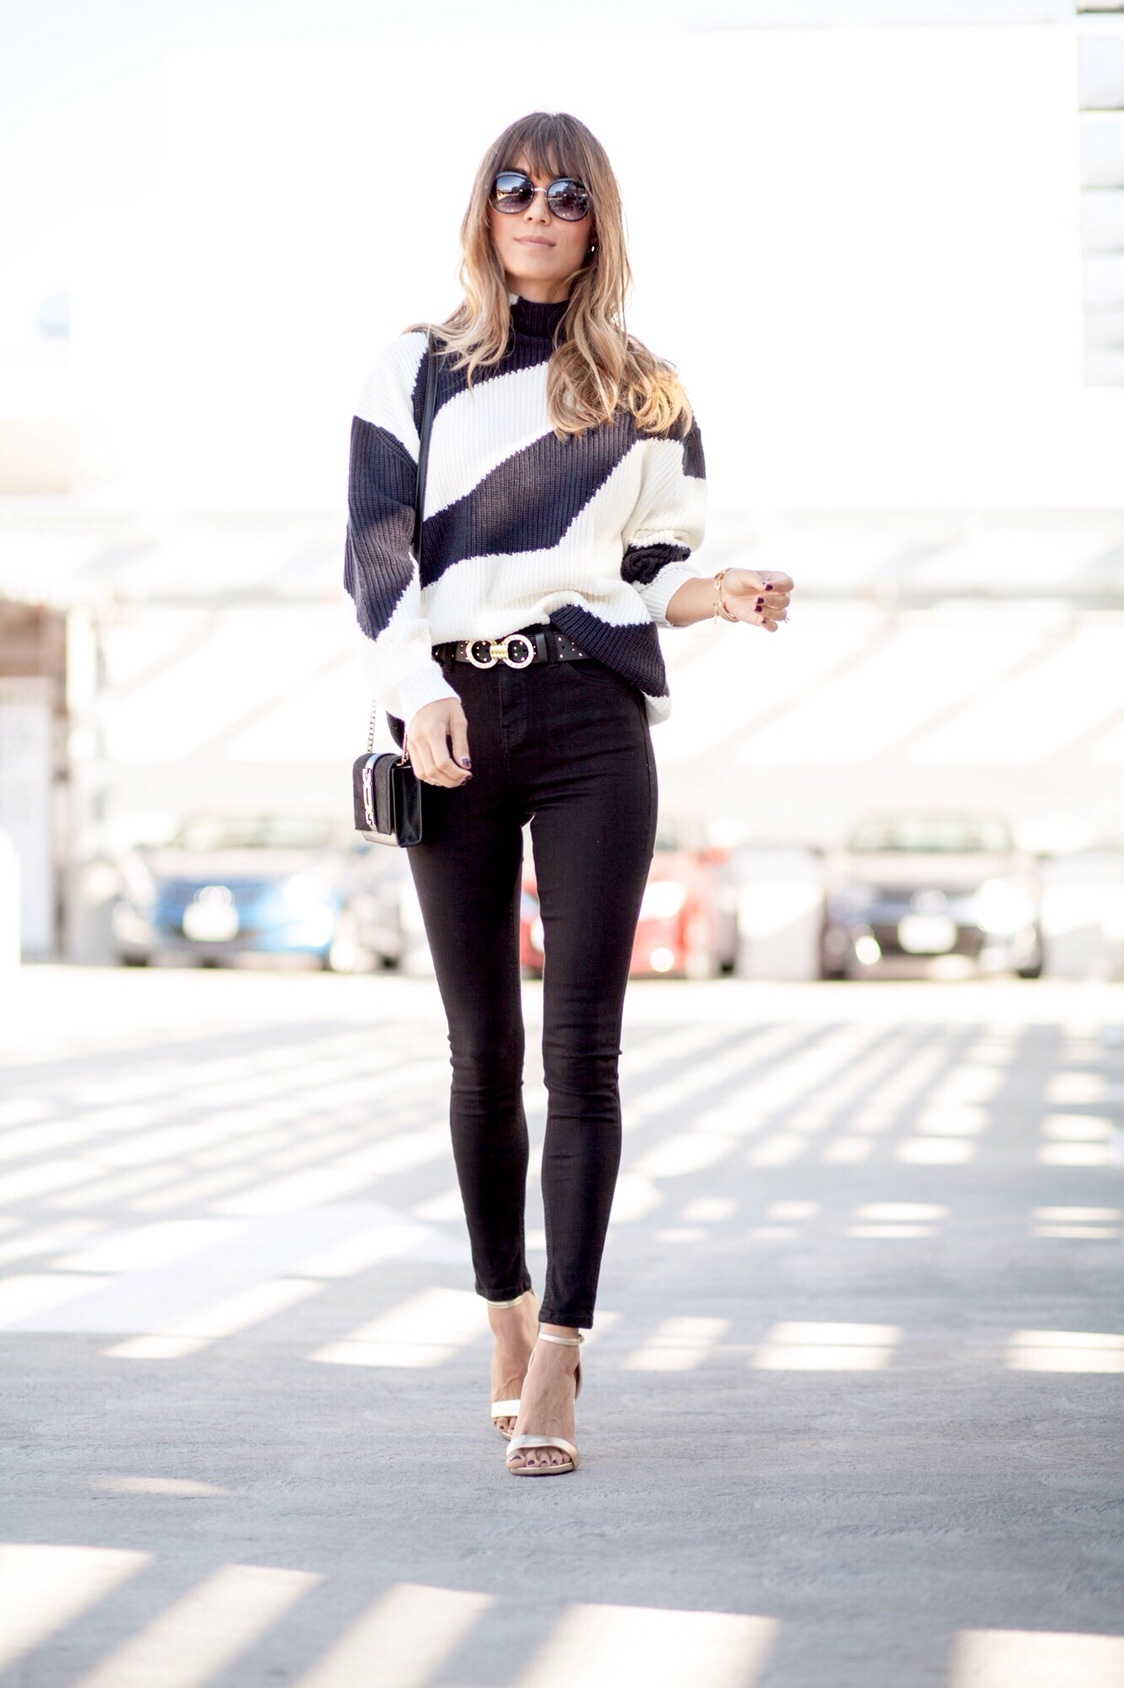 Perfect skinny black jeans